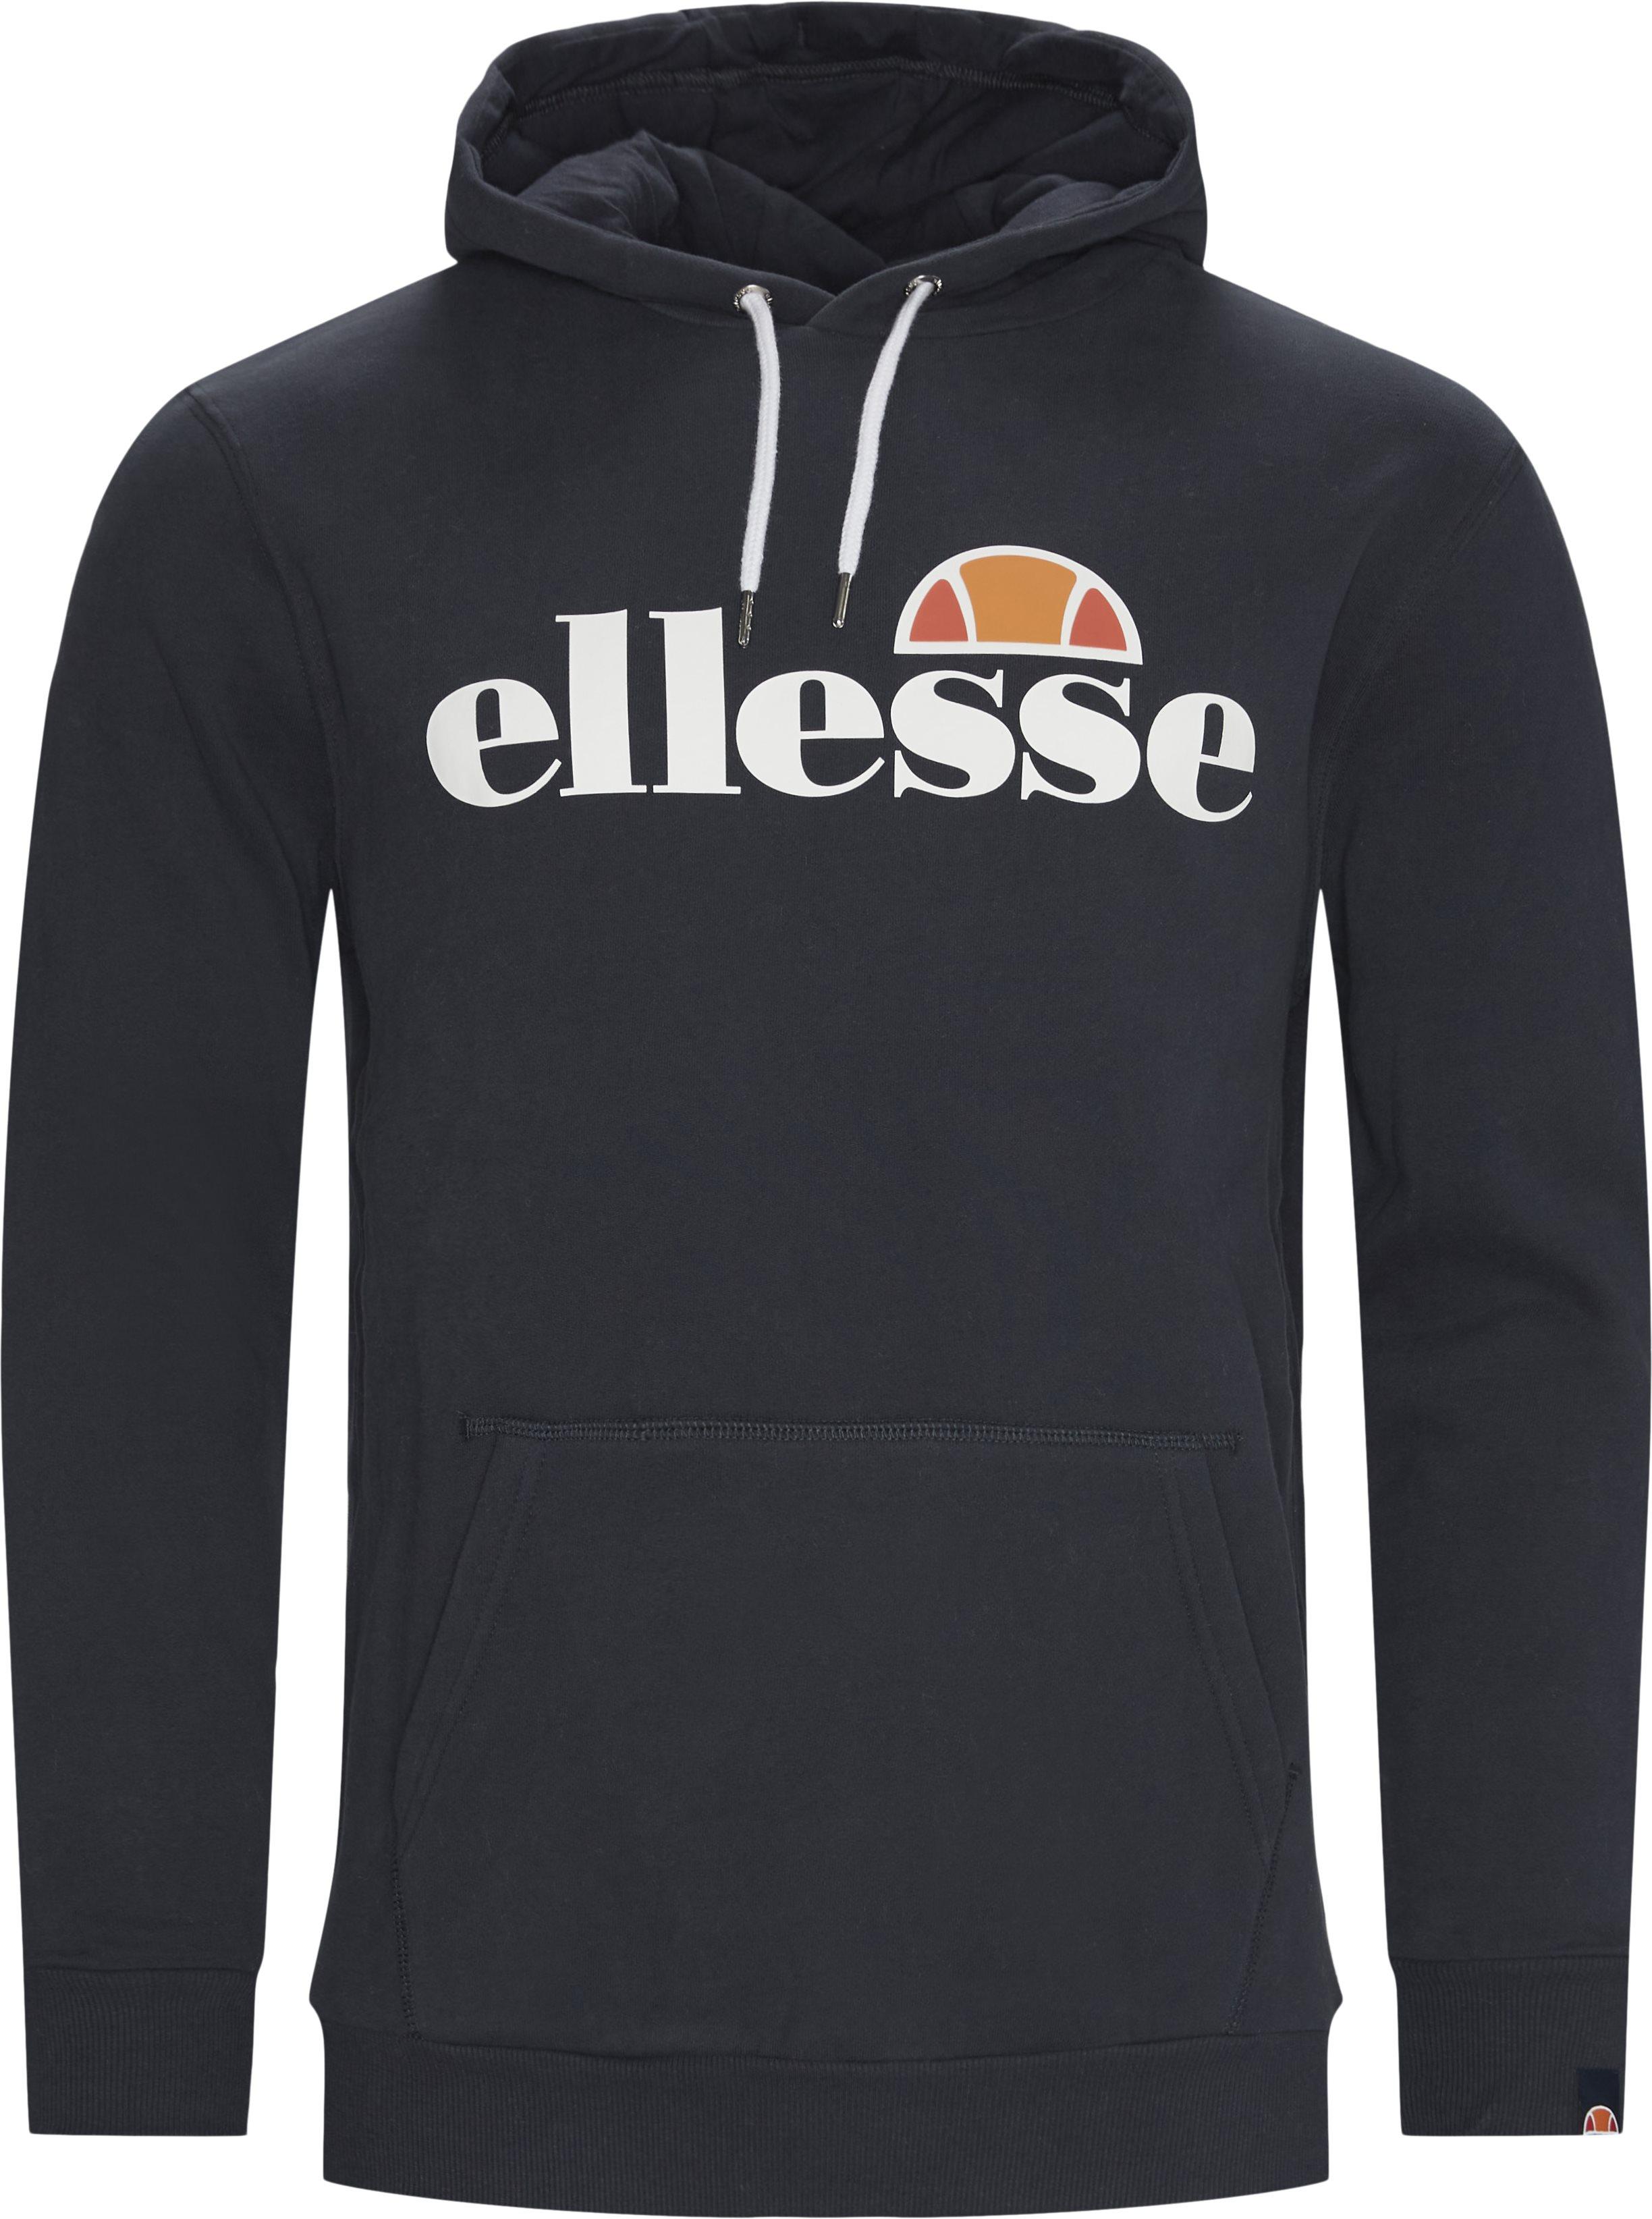 Gottero Hoody Sweatshirt - Sweatshirts - Regular - Blå